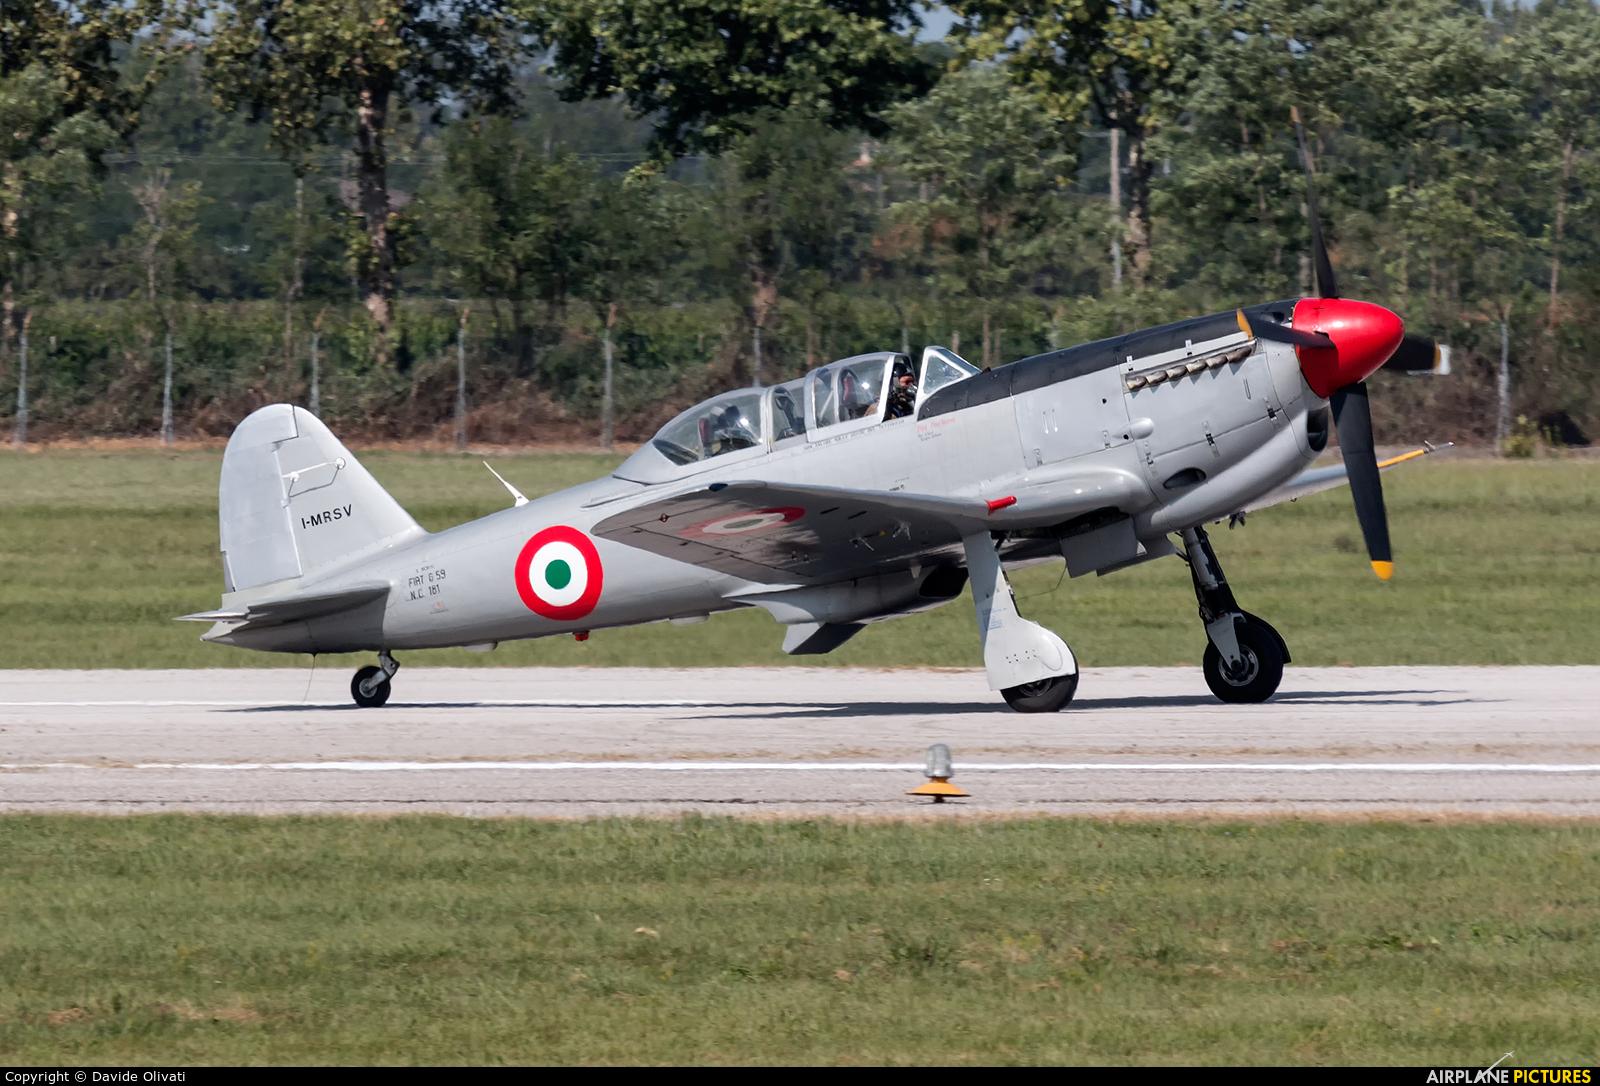 Private I-MRSV aircraft at Rivolto